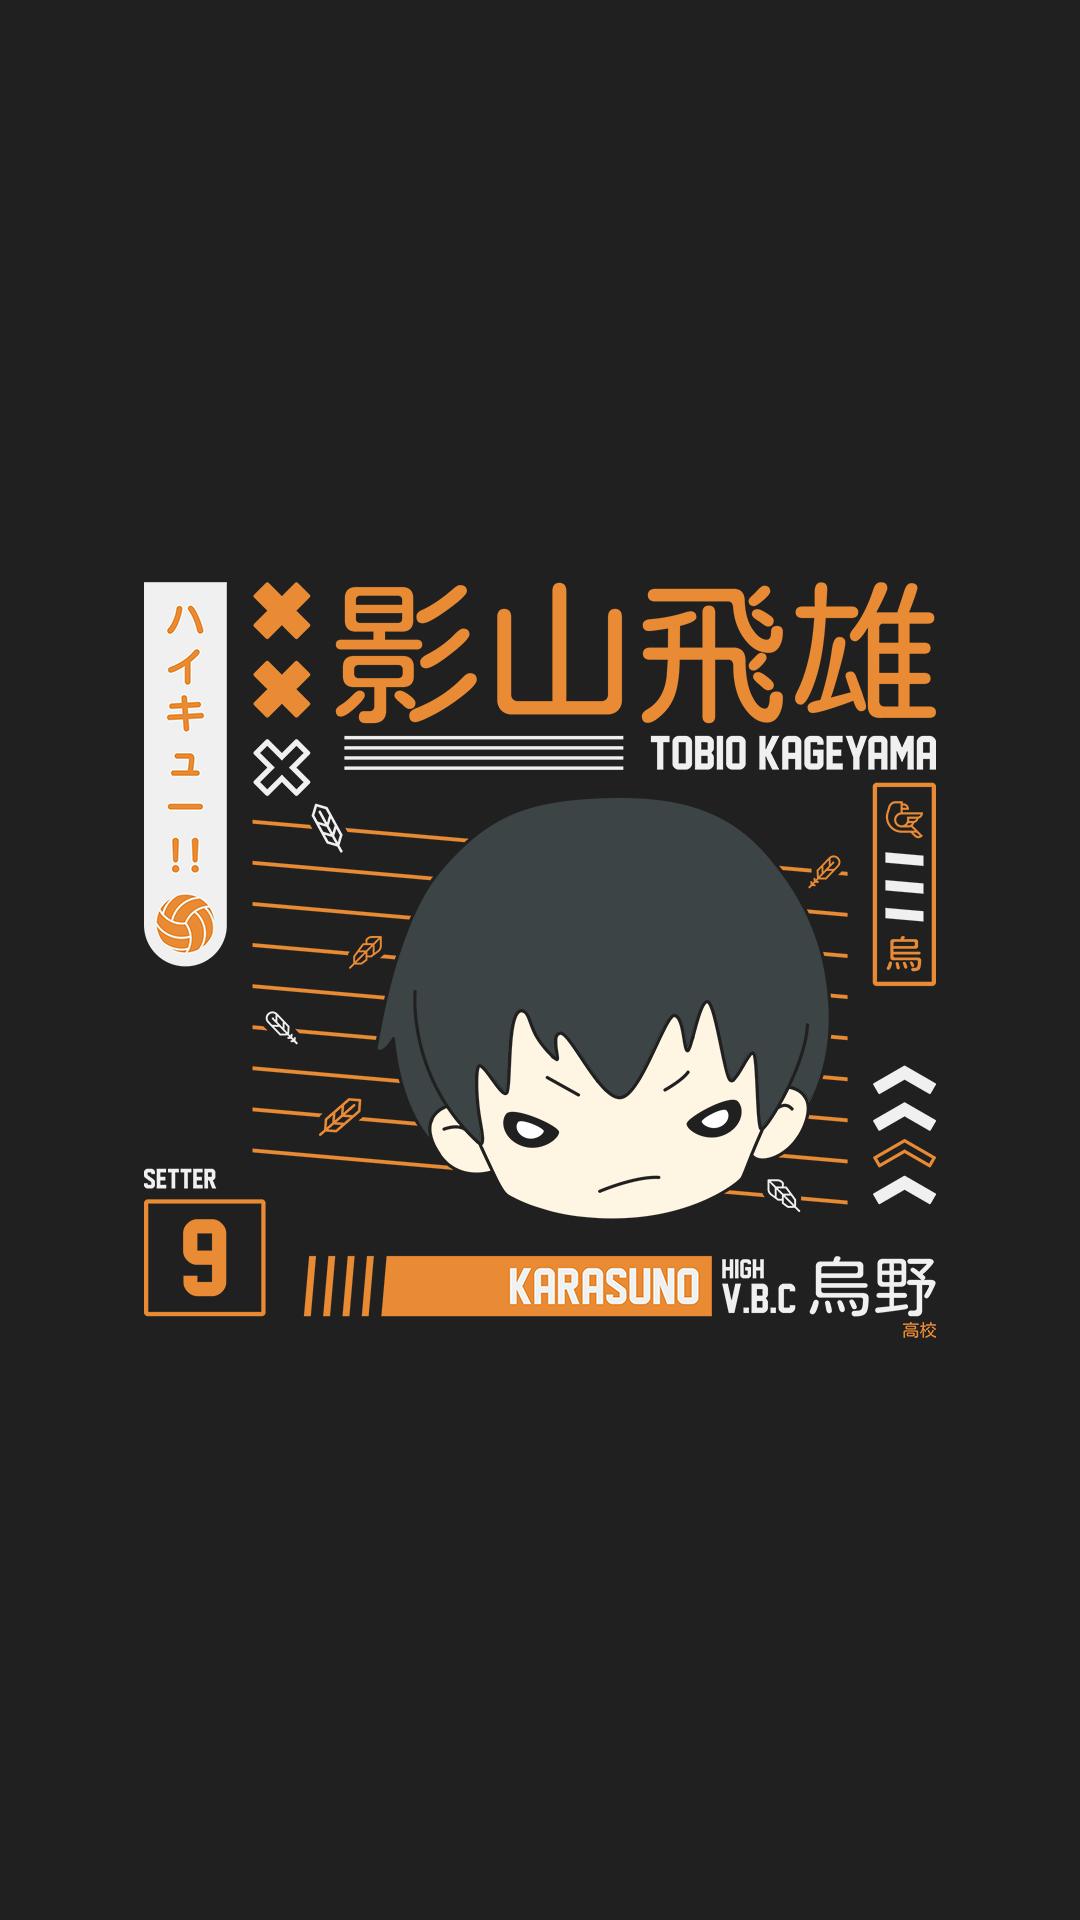 Tobio Kageyama Wallpaper Karasuno In 2020 Haikyuu Kageyama Haikyuu Anime Haikyuu